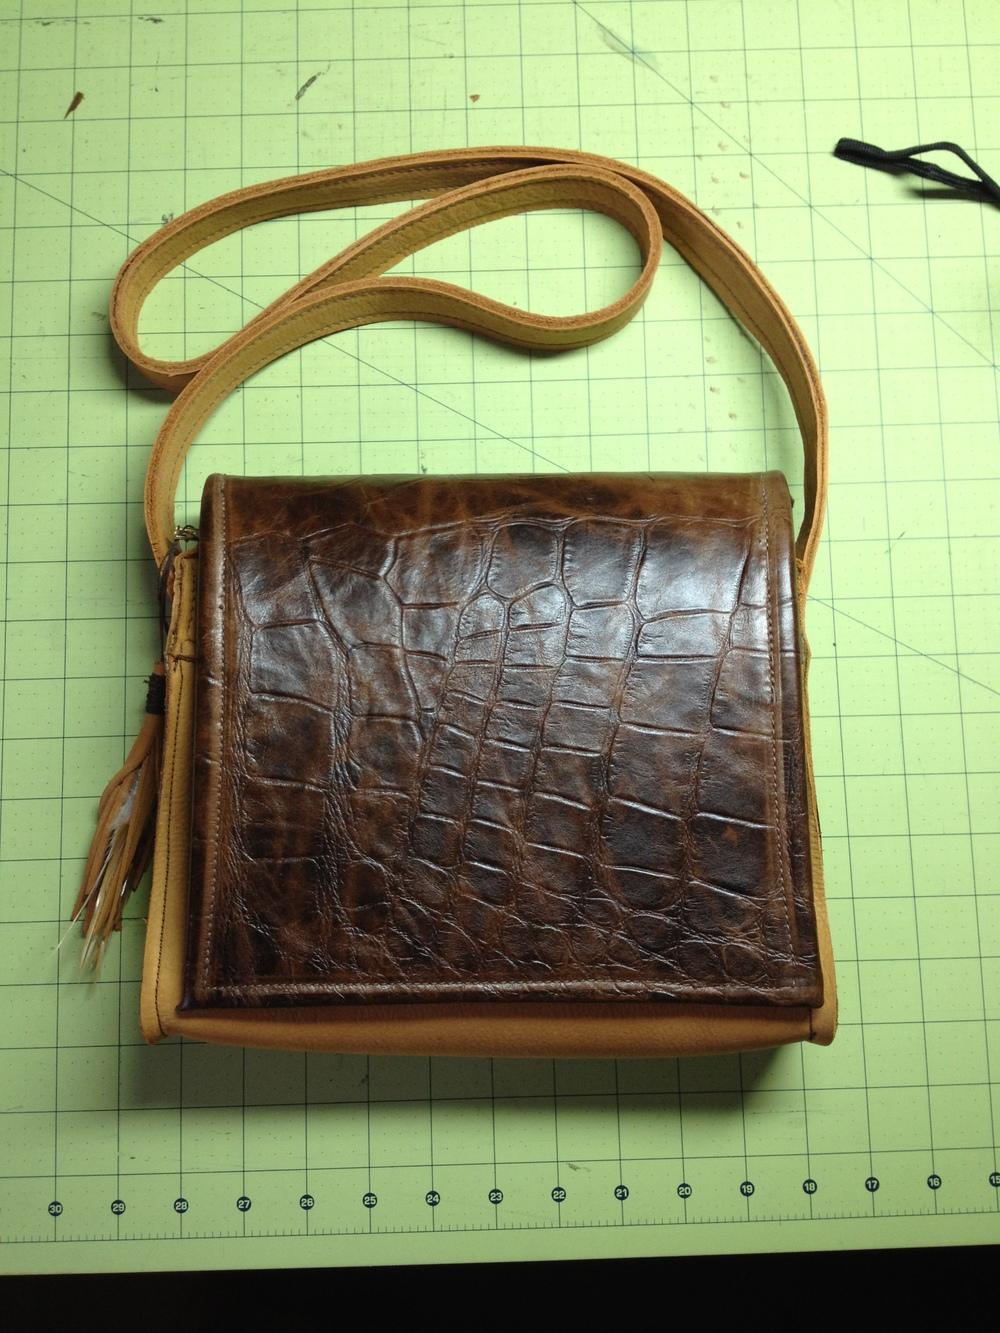 The Carolina Handbag